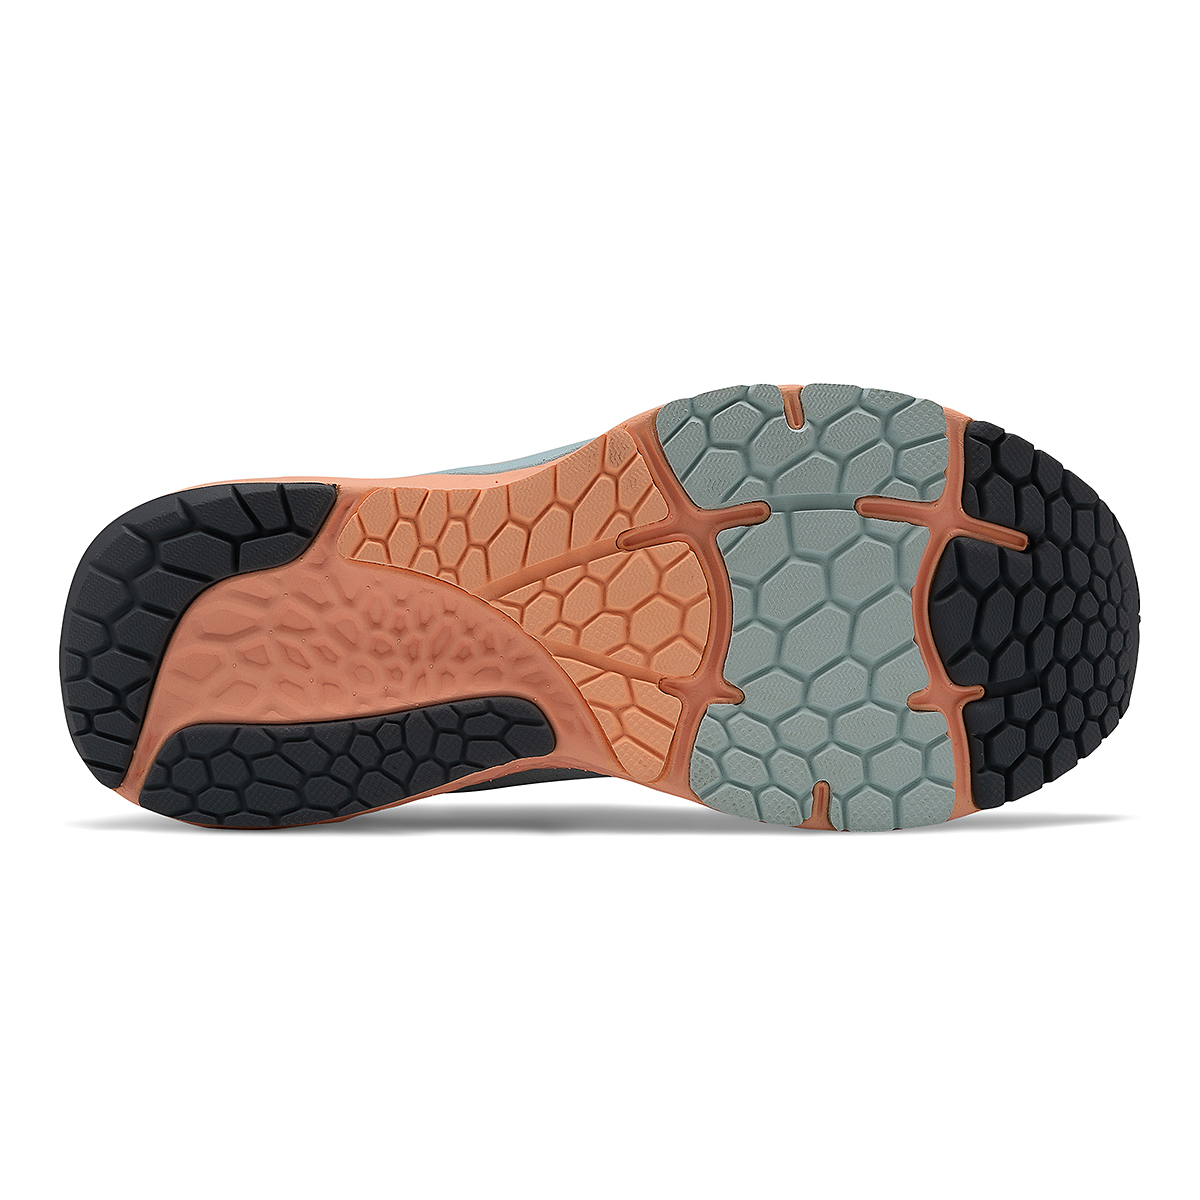 Women's New Balance 880V11 Running Shoe - Color: Pale Blue Chill/Light Mango - Size: 5 - Width: Narrow, Pale Blue Chill/Light Mango, large, image 5